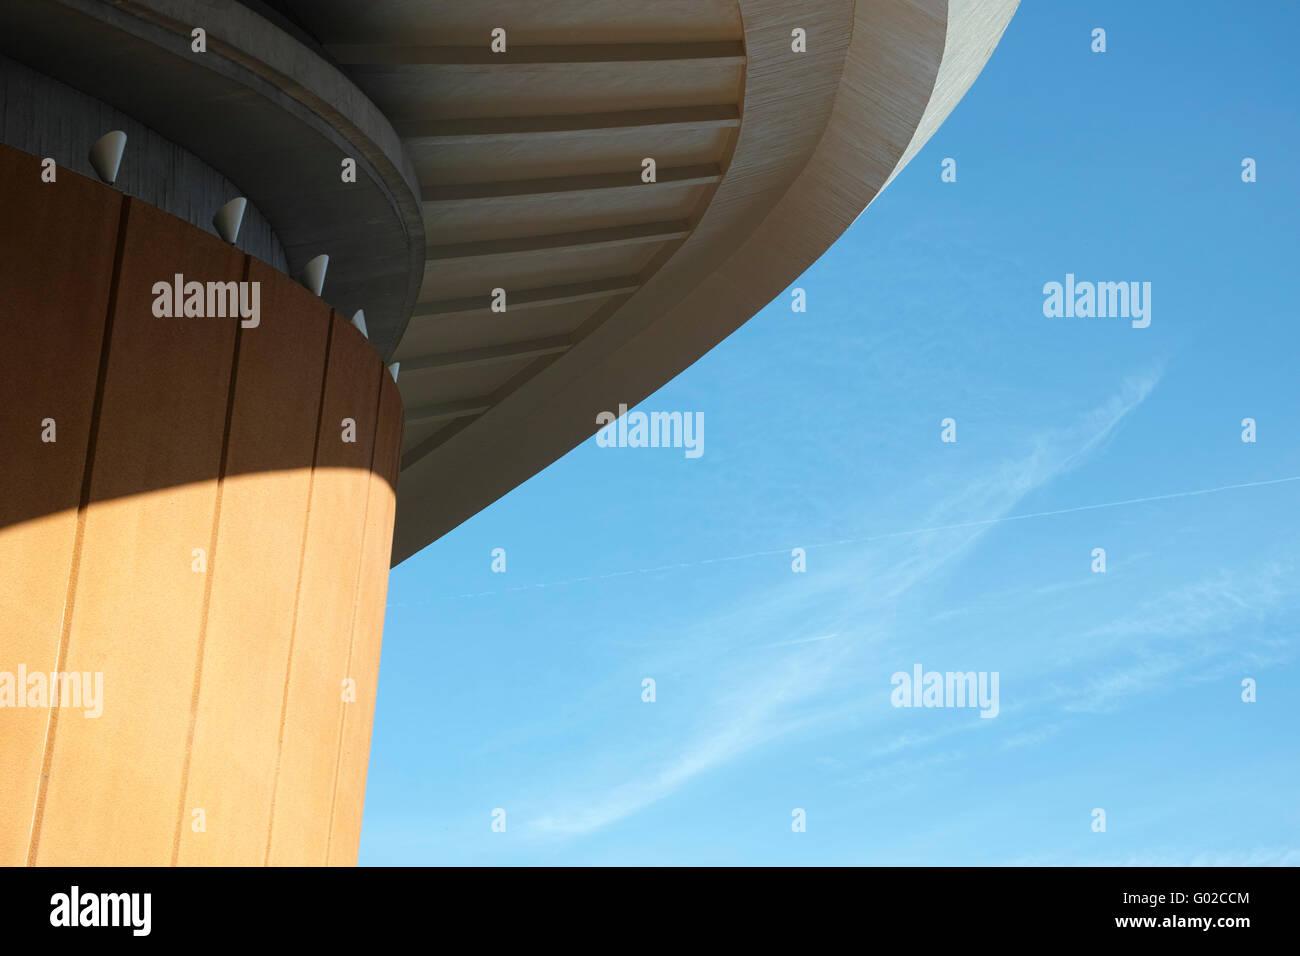 The Haus der Kulturen der Welt (House of World Cultures) in Berlin, roof and facade details. - Stock Image